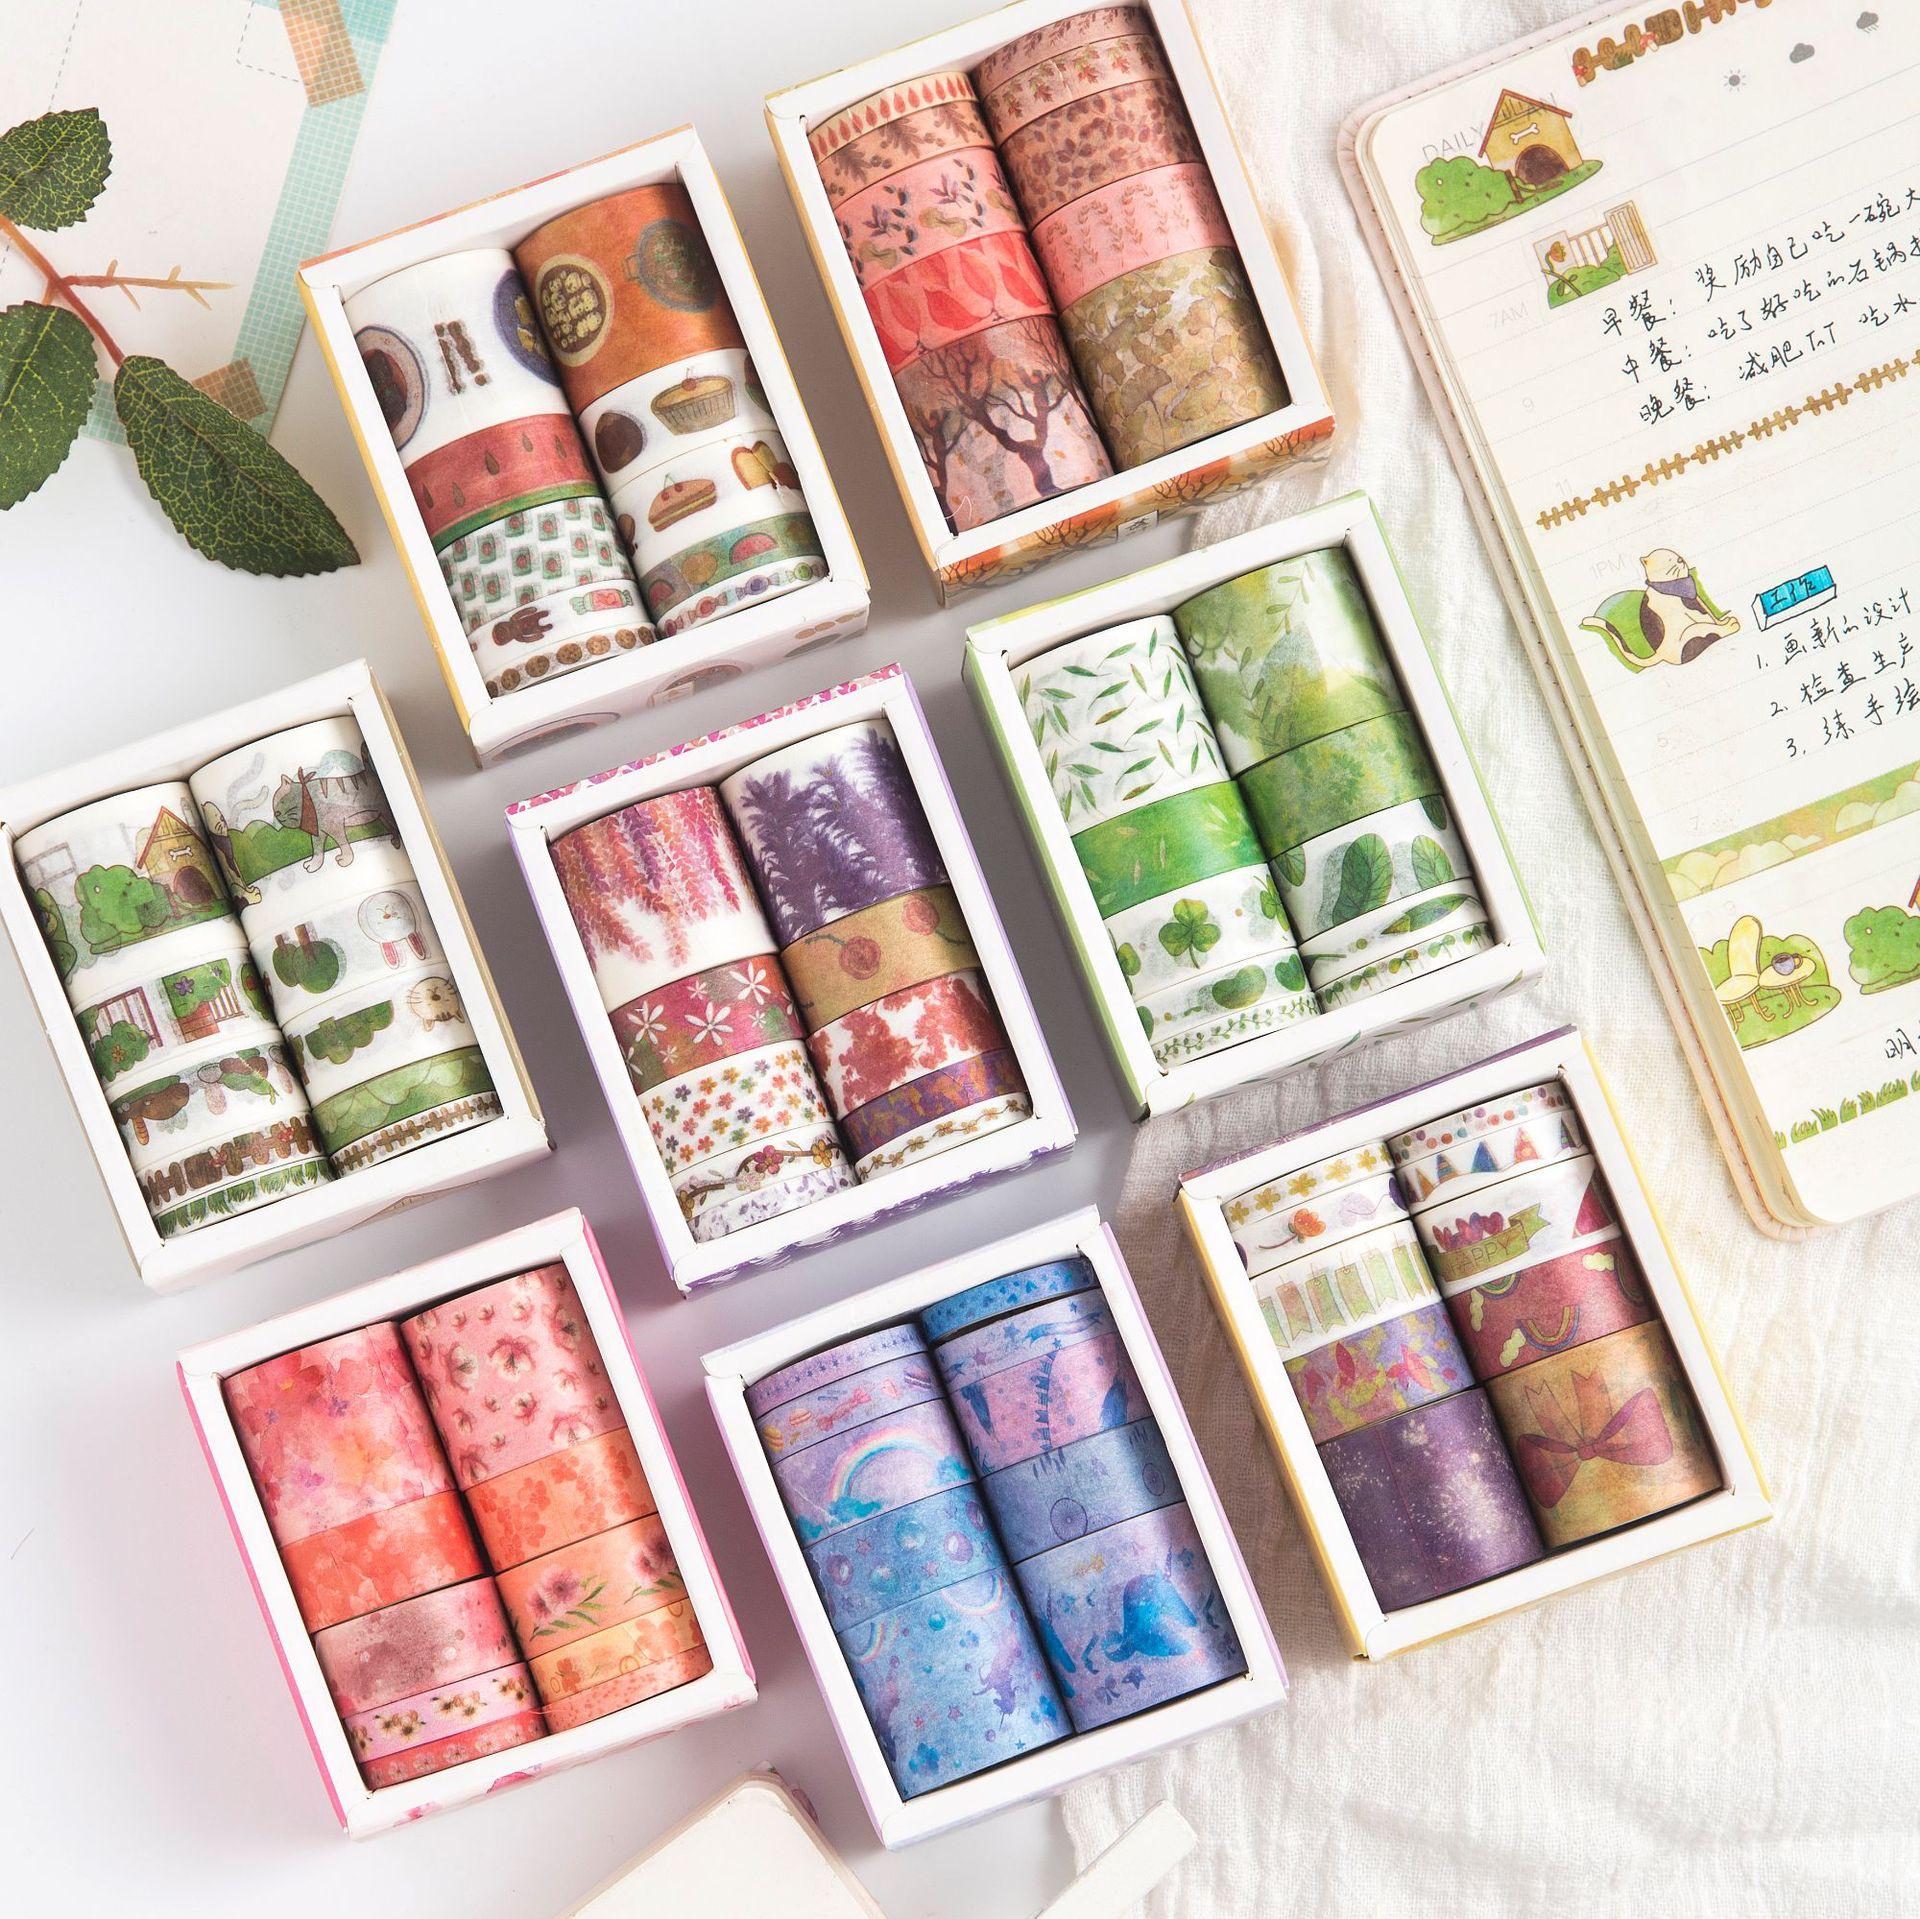 10pcs/lot Girlish Heart Series Floral Cute Paper Masking Washi Tape Set Japanese Stationery Kawaii Scrapbooking Supplies Sticker